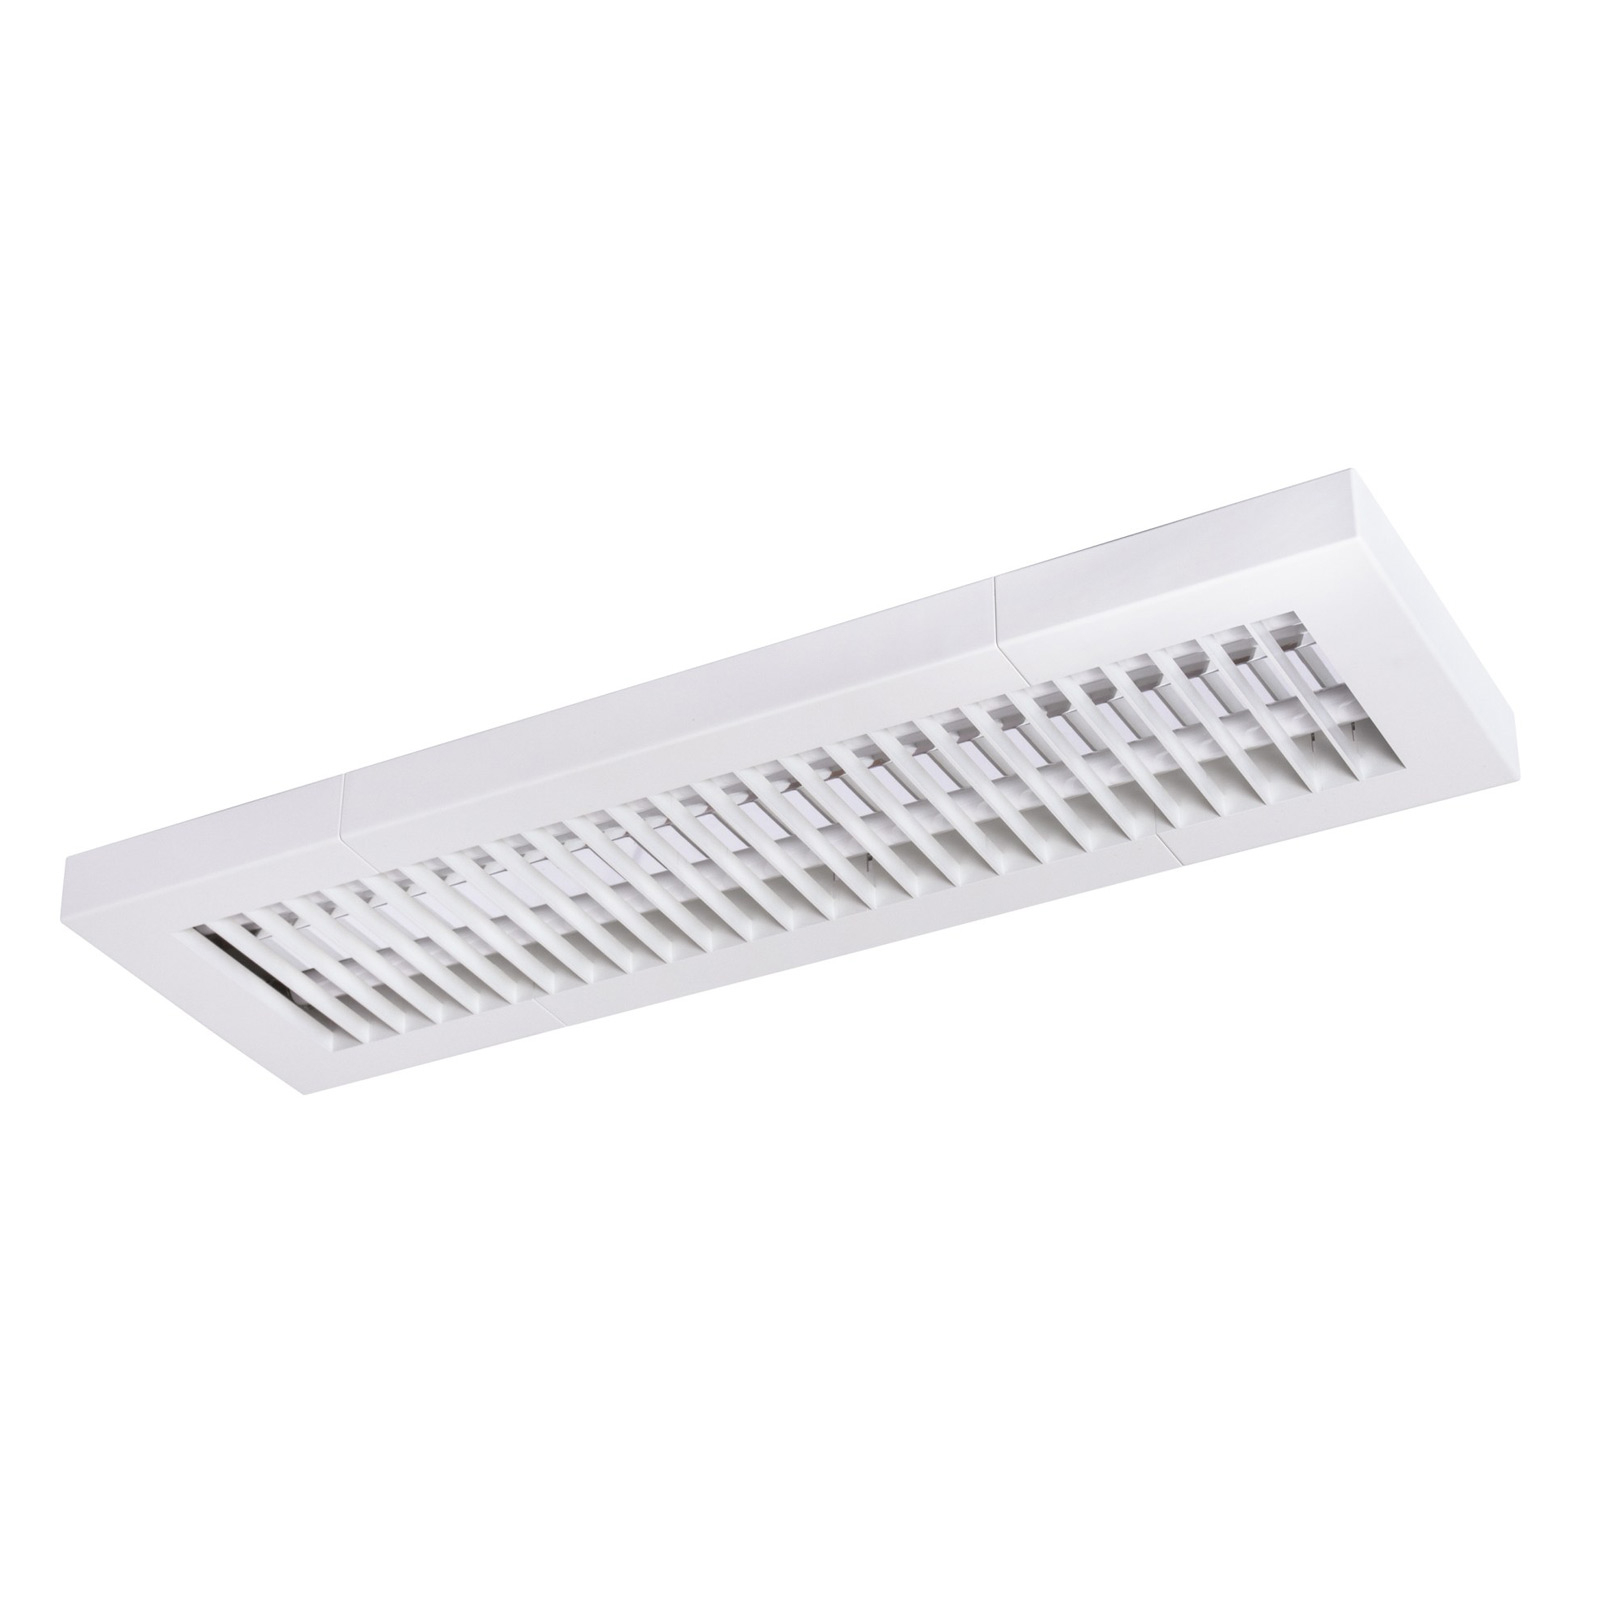 LED plafondlamp Memo DIM 60, daglicht